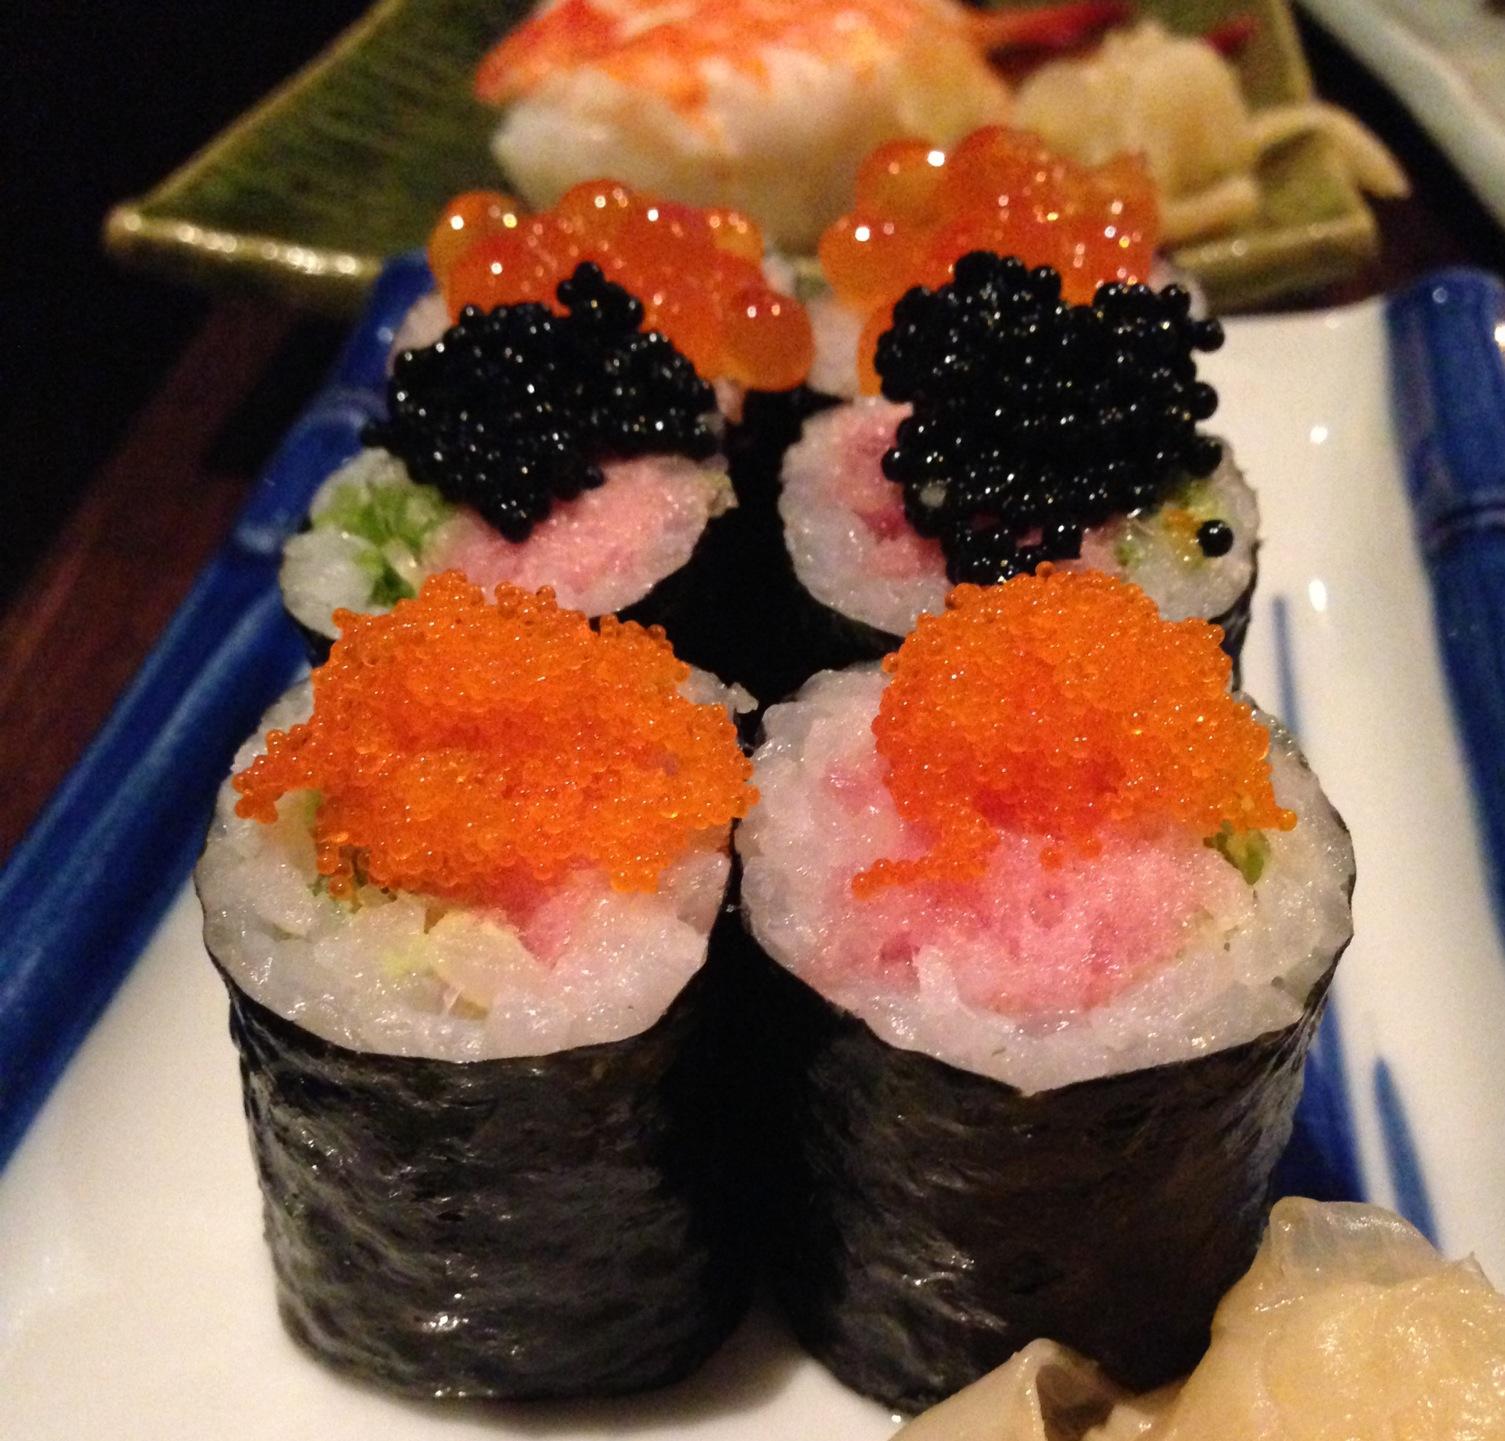 Fatty tuna, scallions, caviar. salmon and masago to TOP it off!